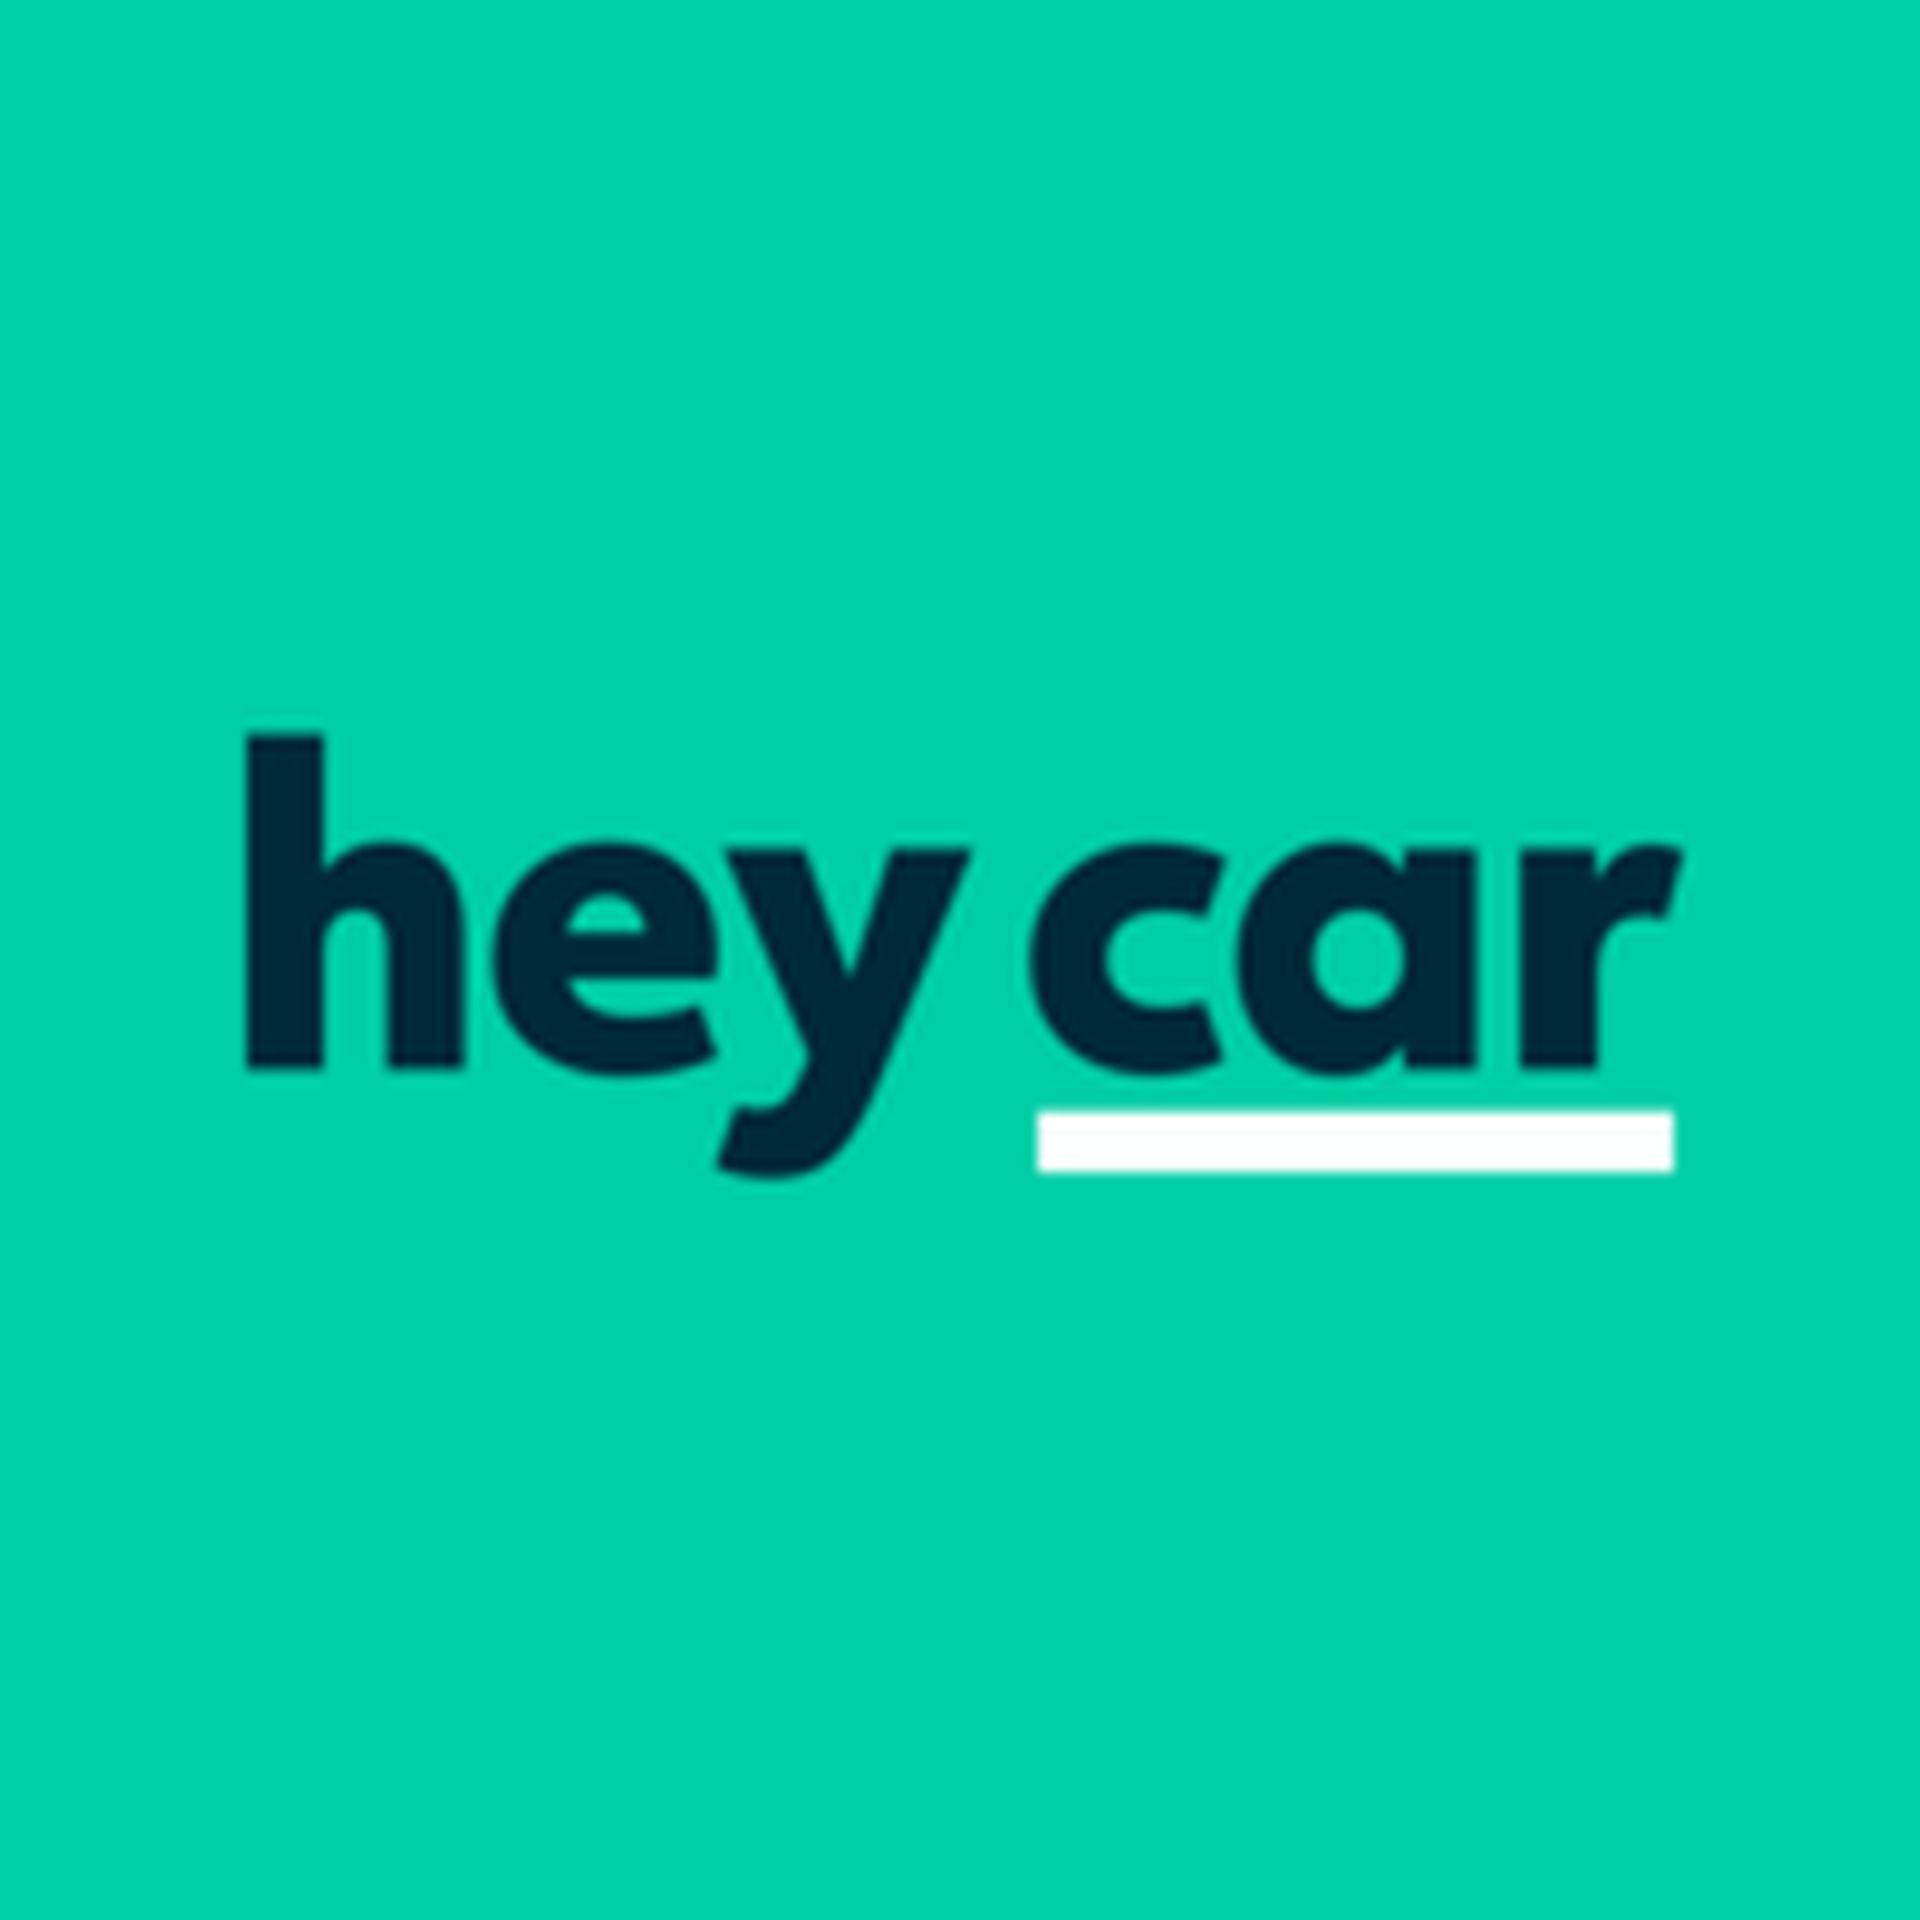 hey.car